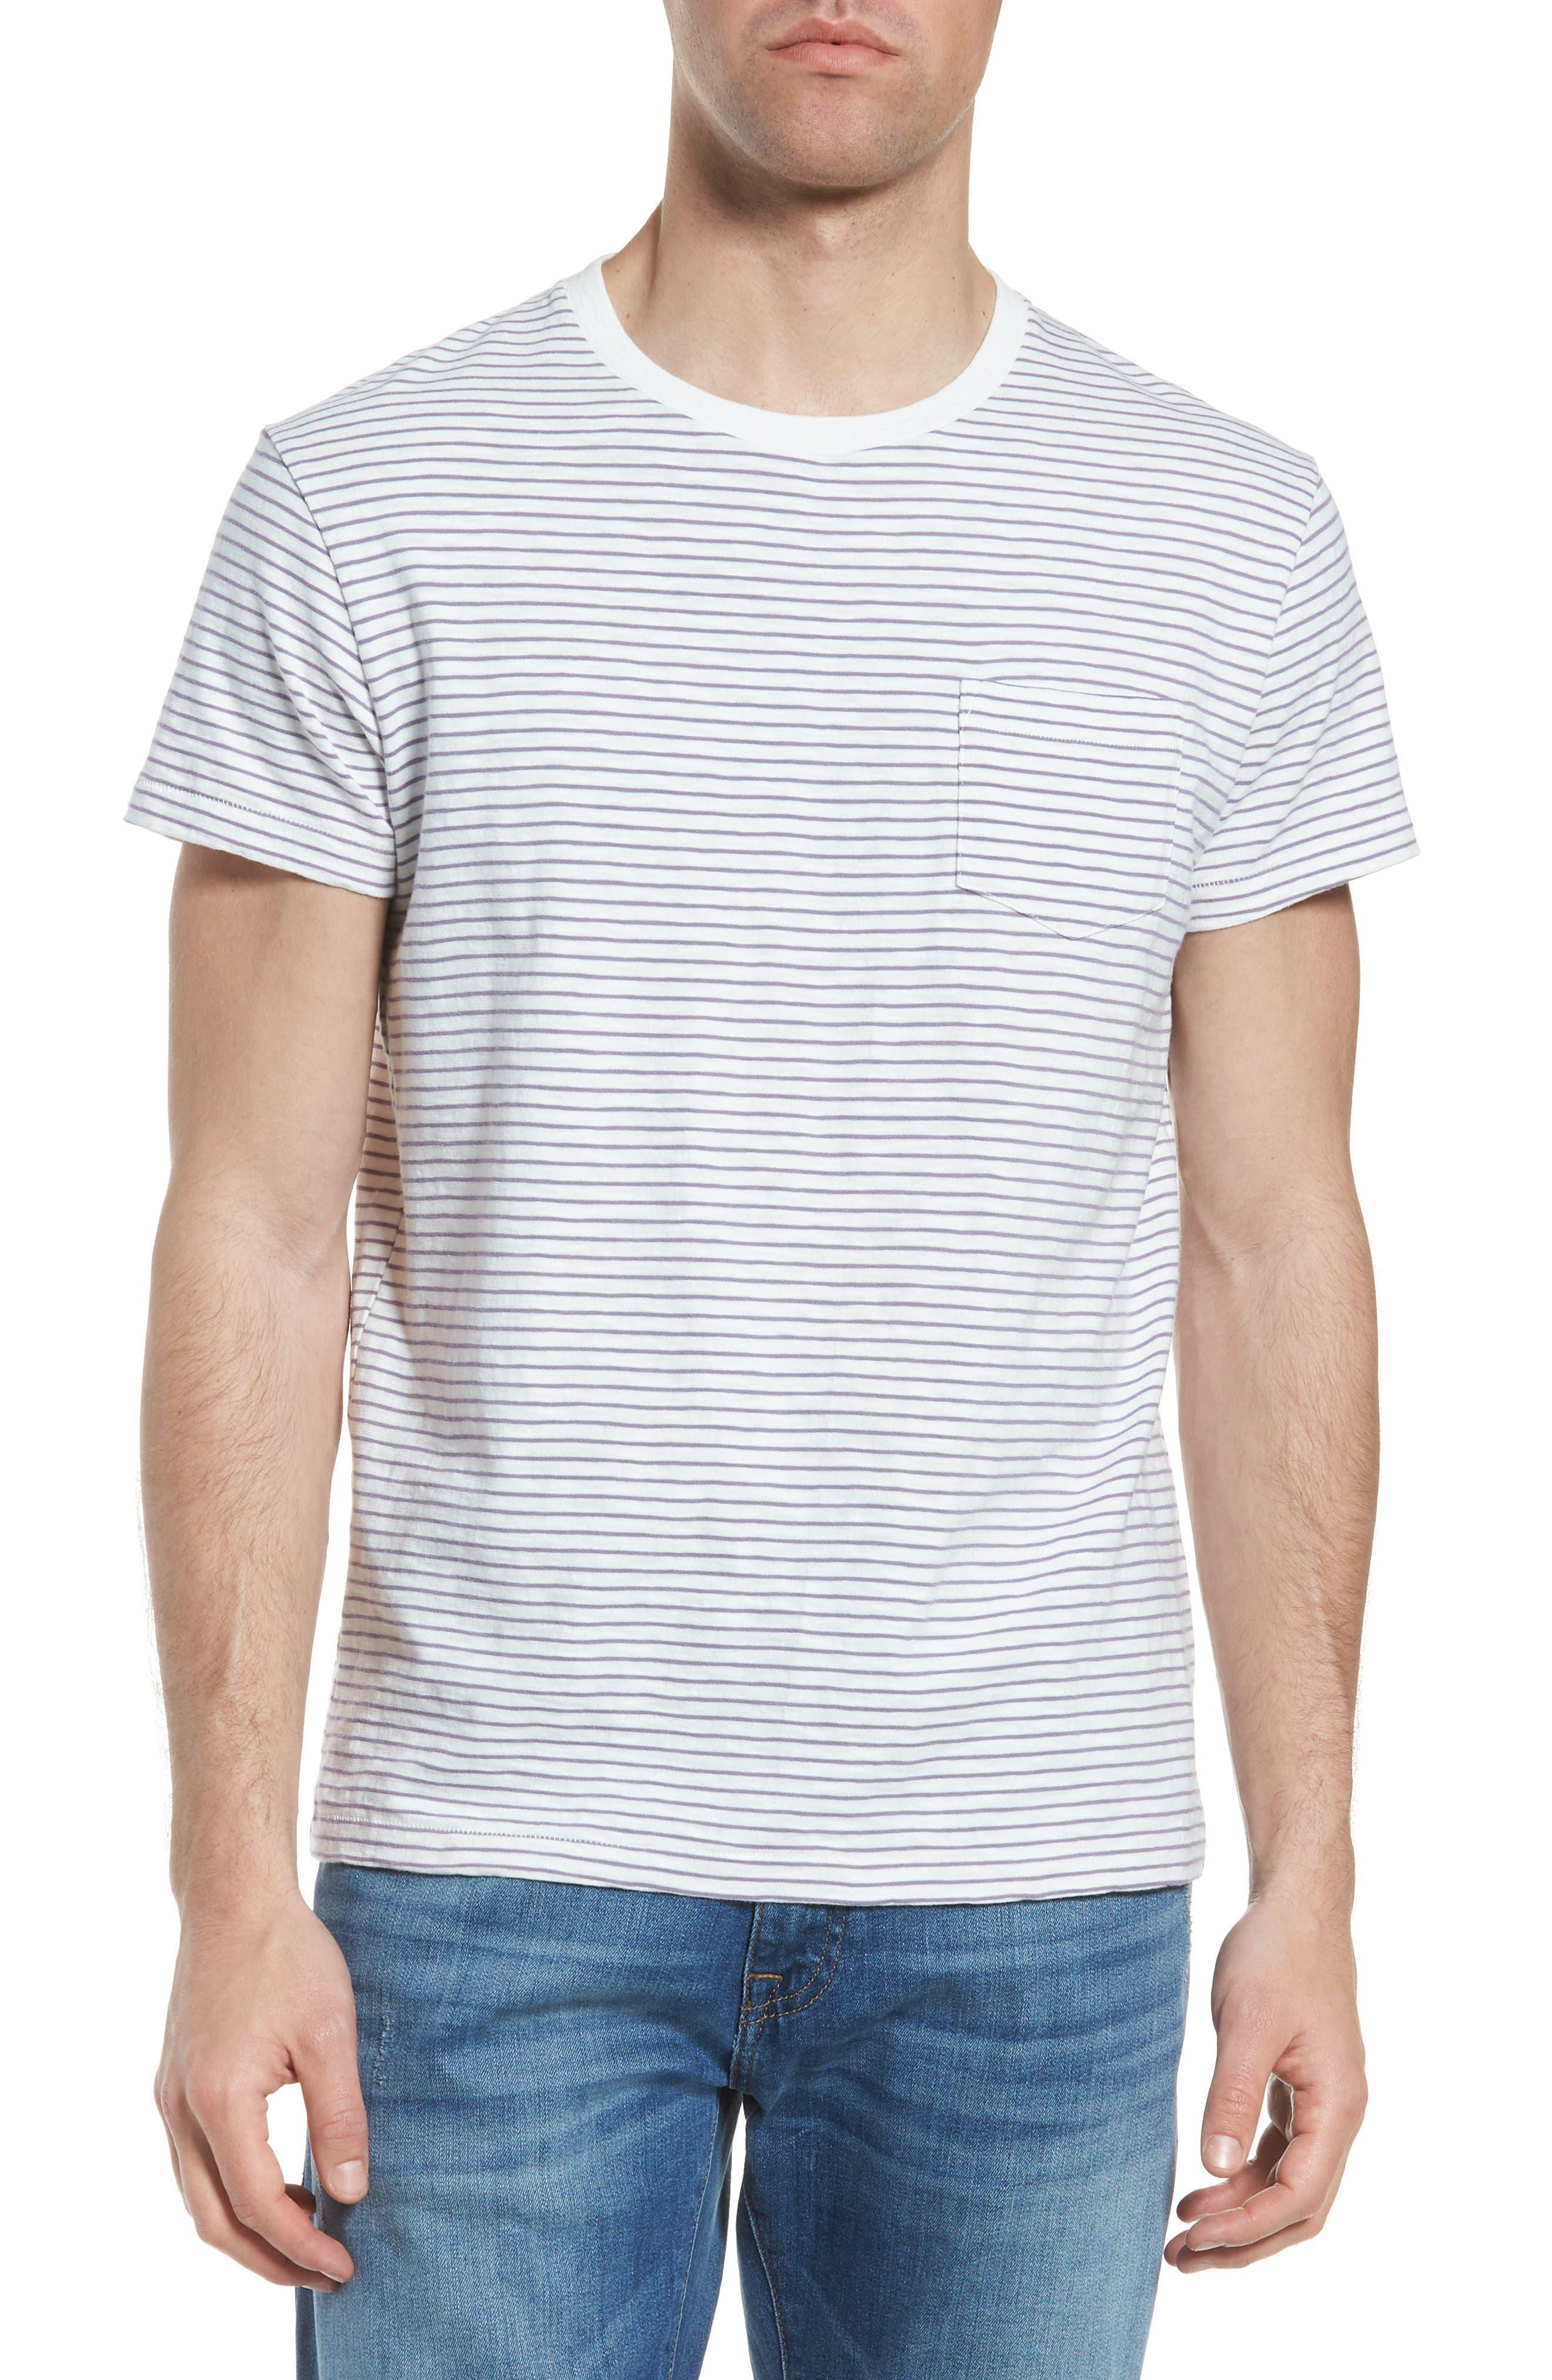 Malaga Cove Stripe T-Shirt,                         Main,                         color, Antique White